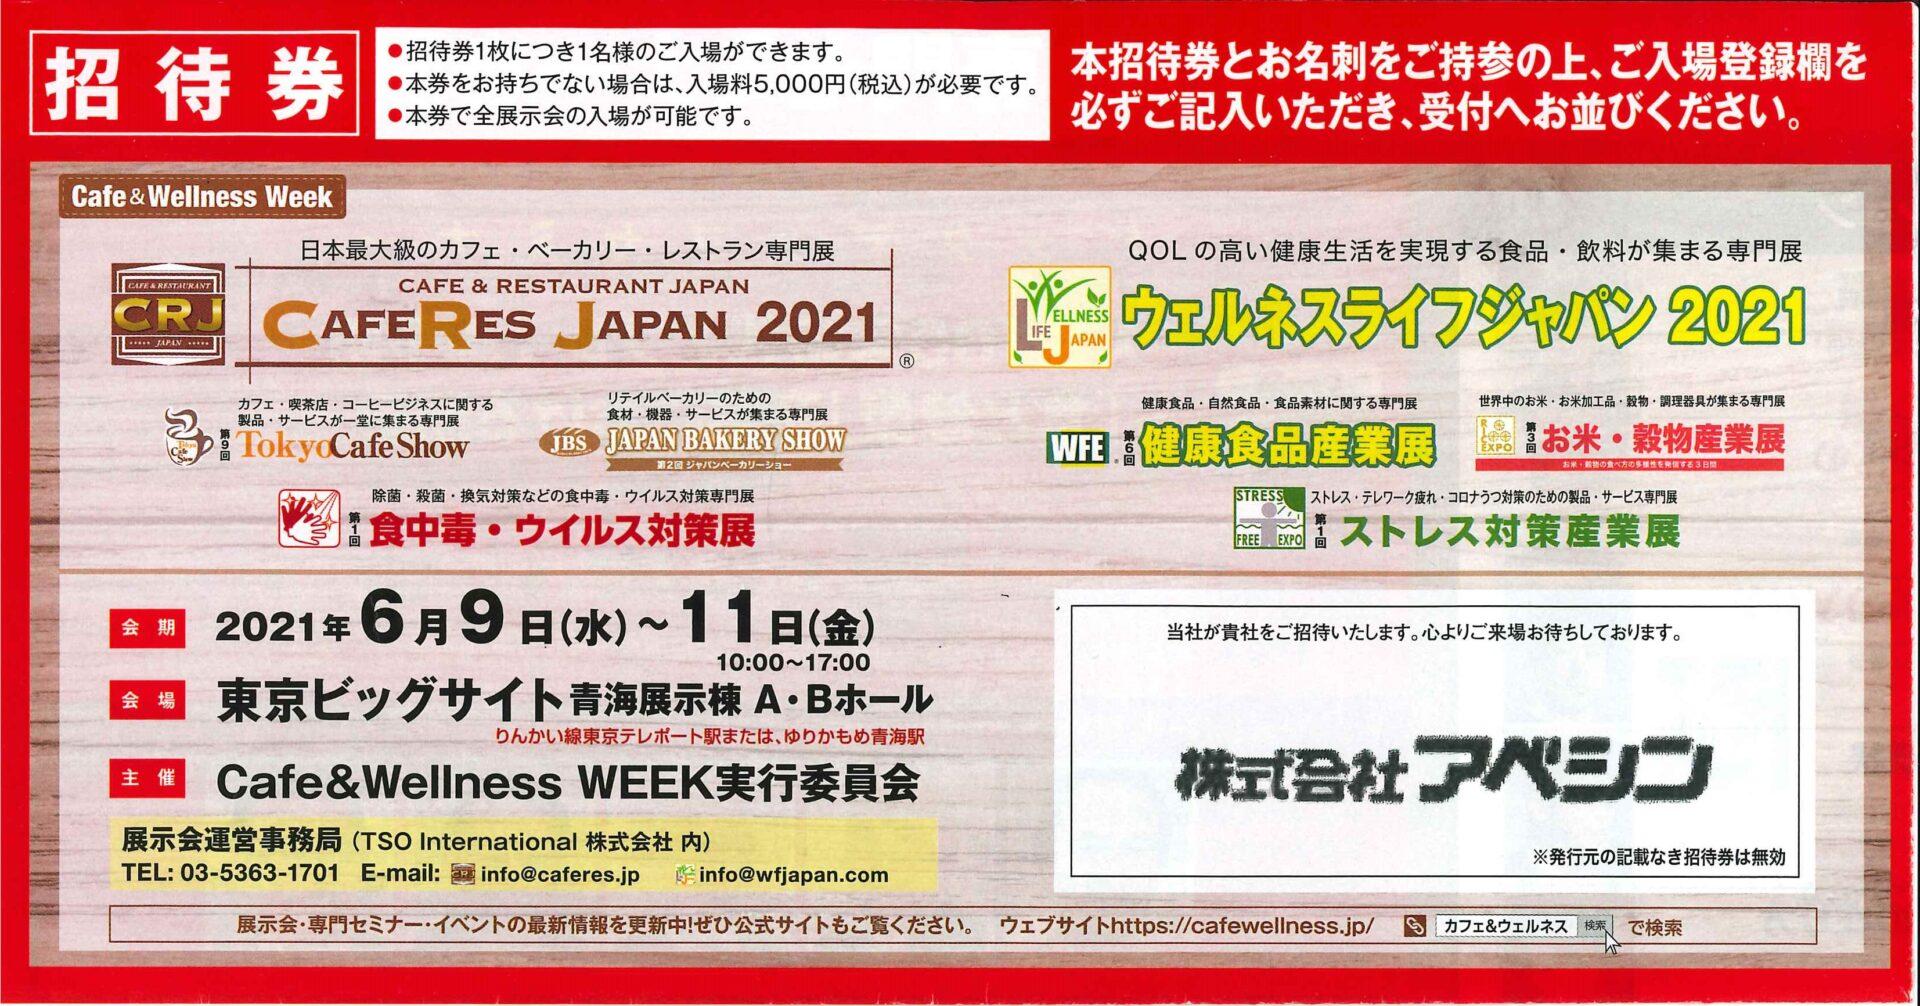 CAFERES JAPAN 2021 に出展いたします